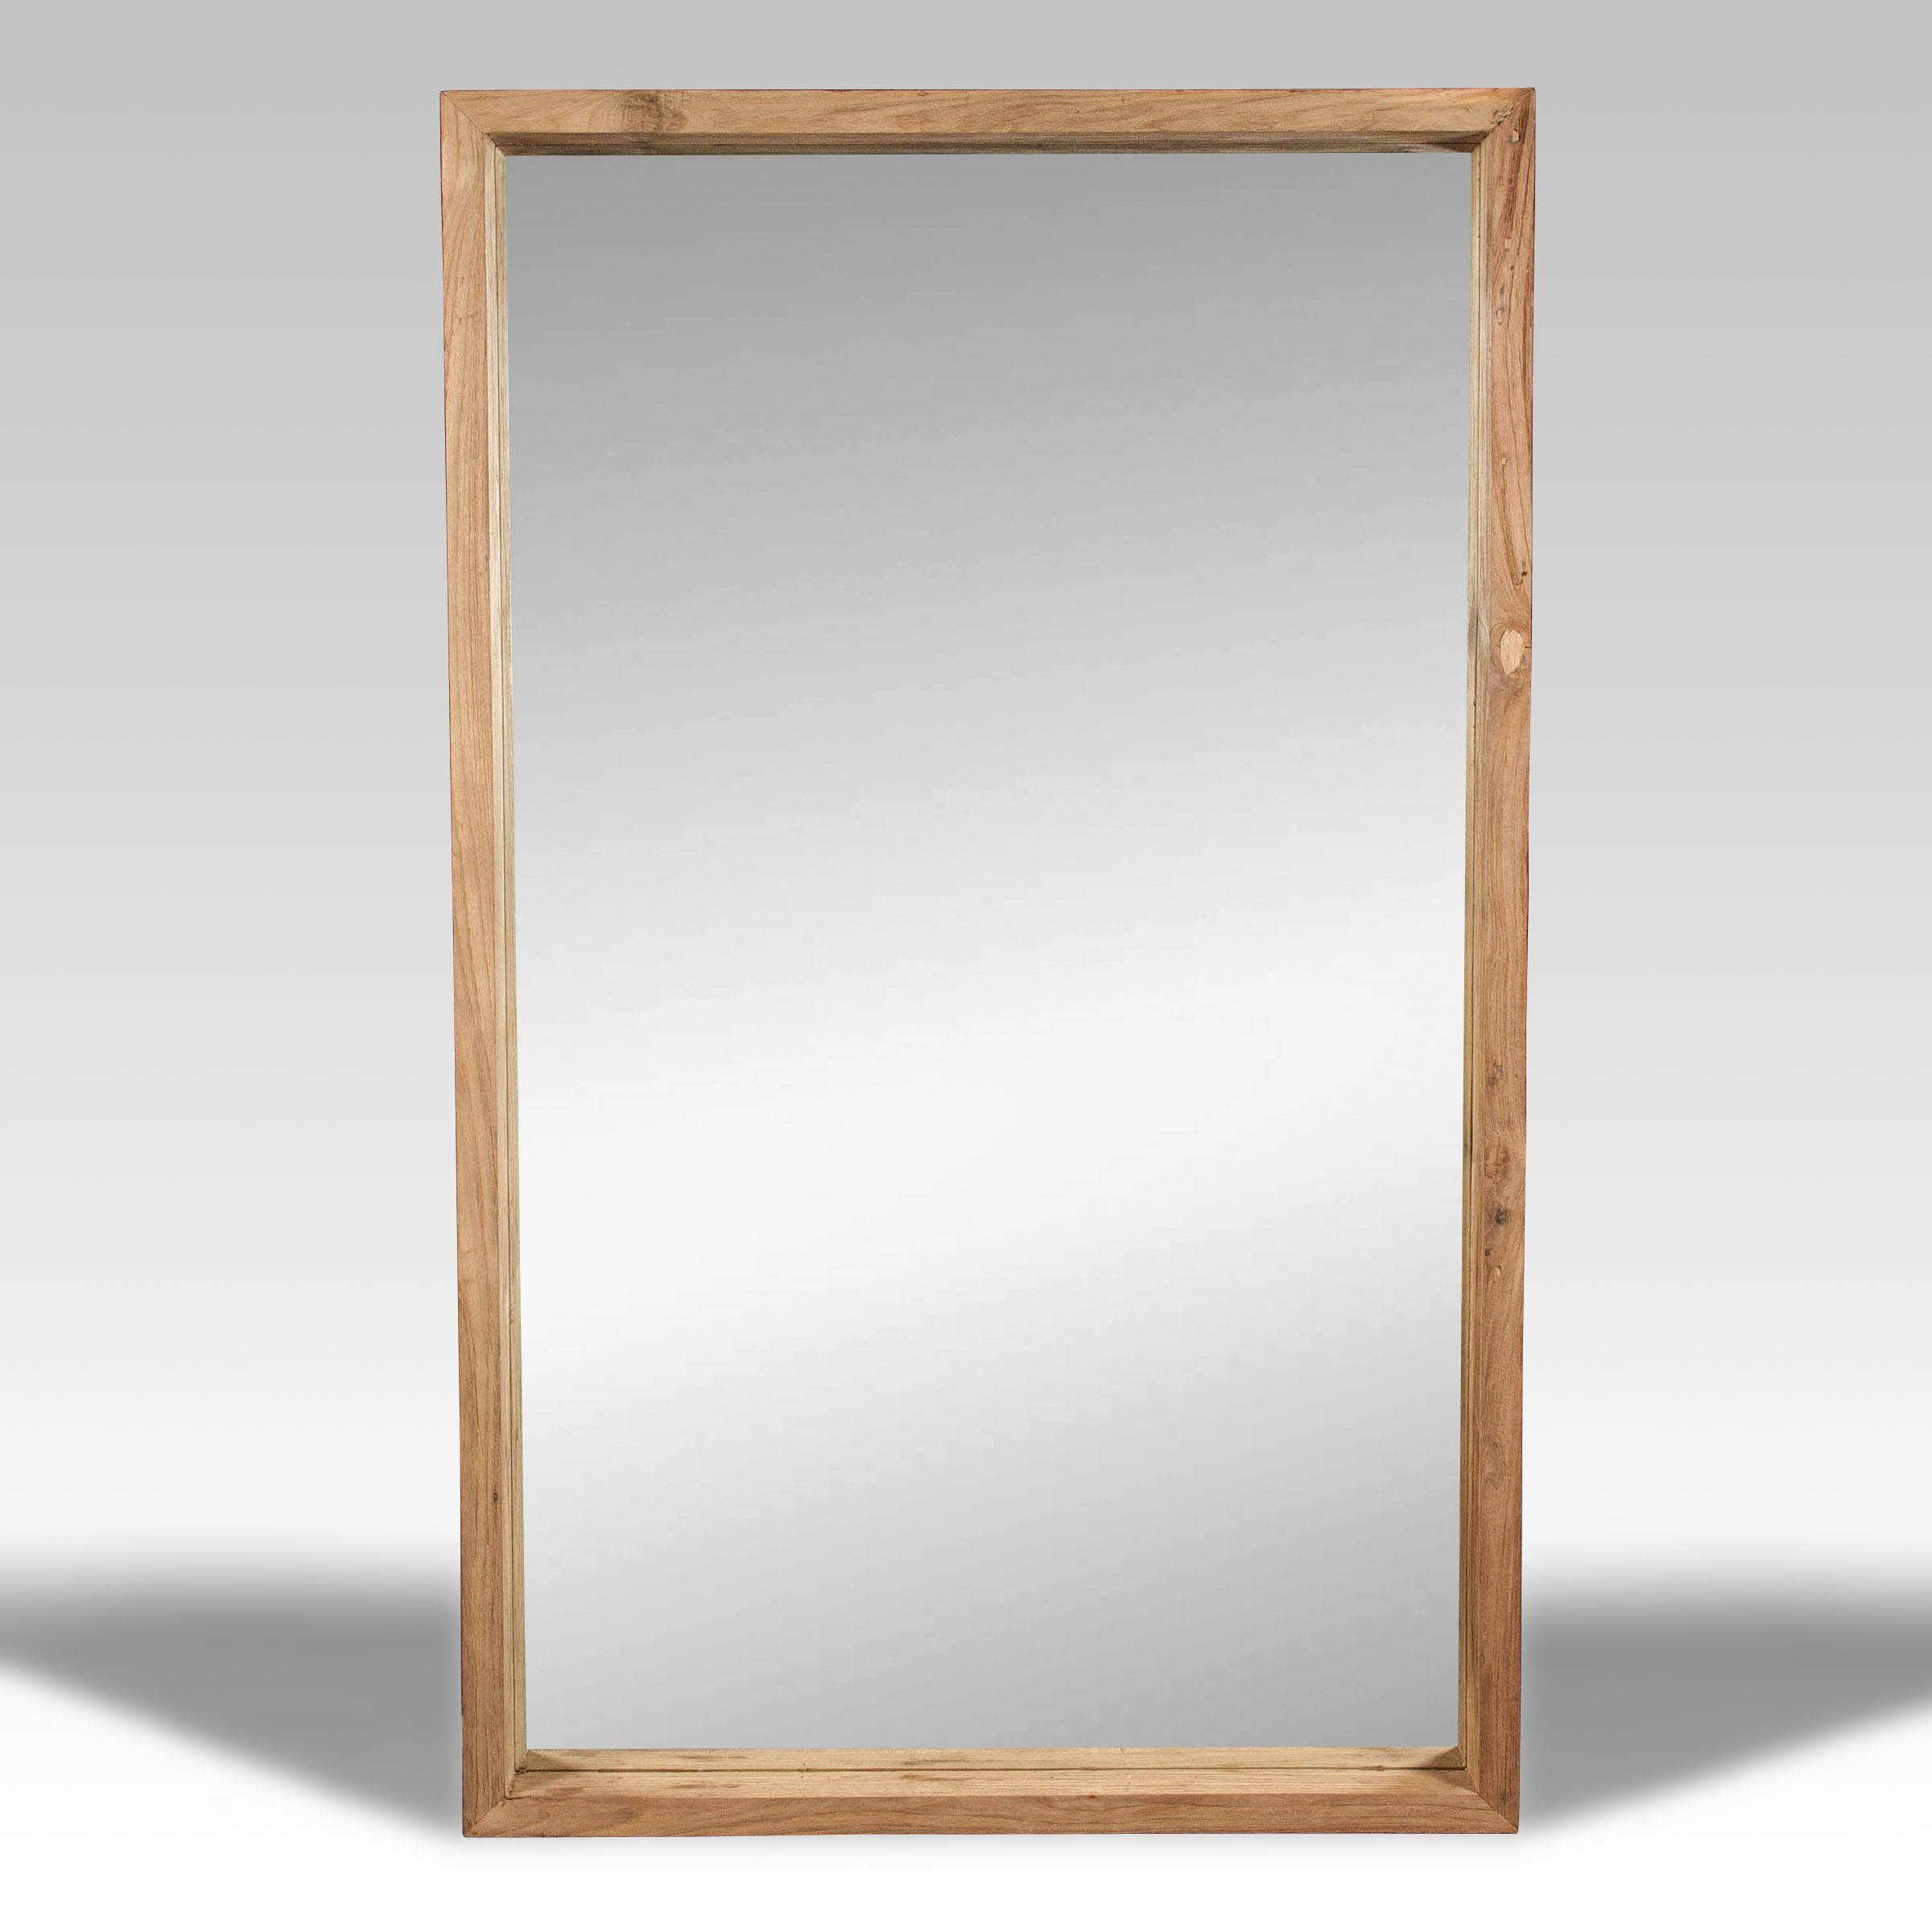 Espejo y espejo de madera batavia for Espejos decorativos de madera